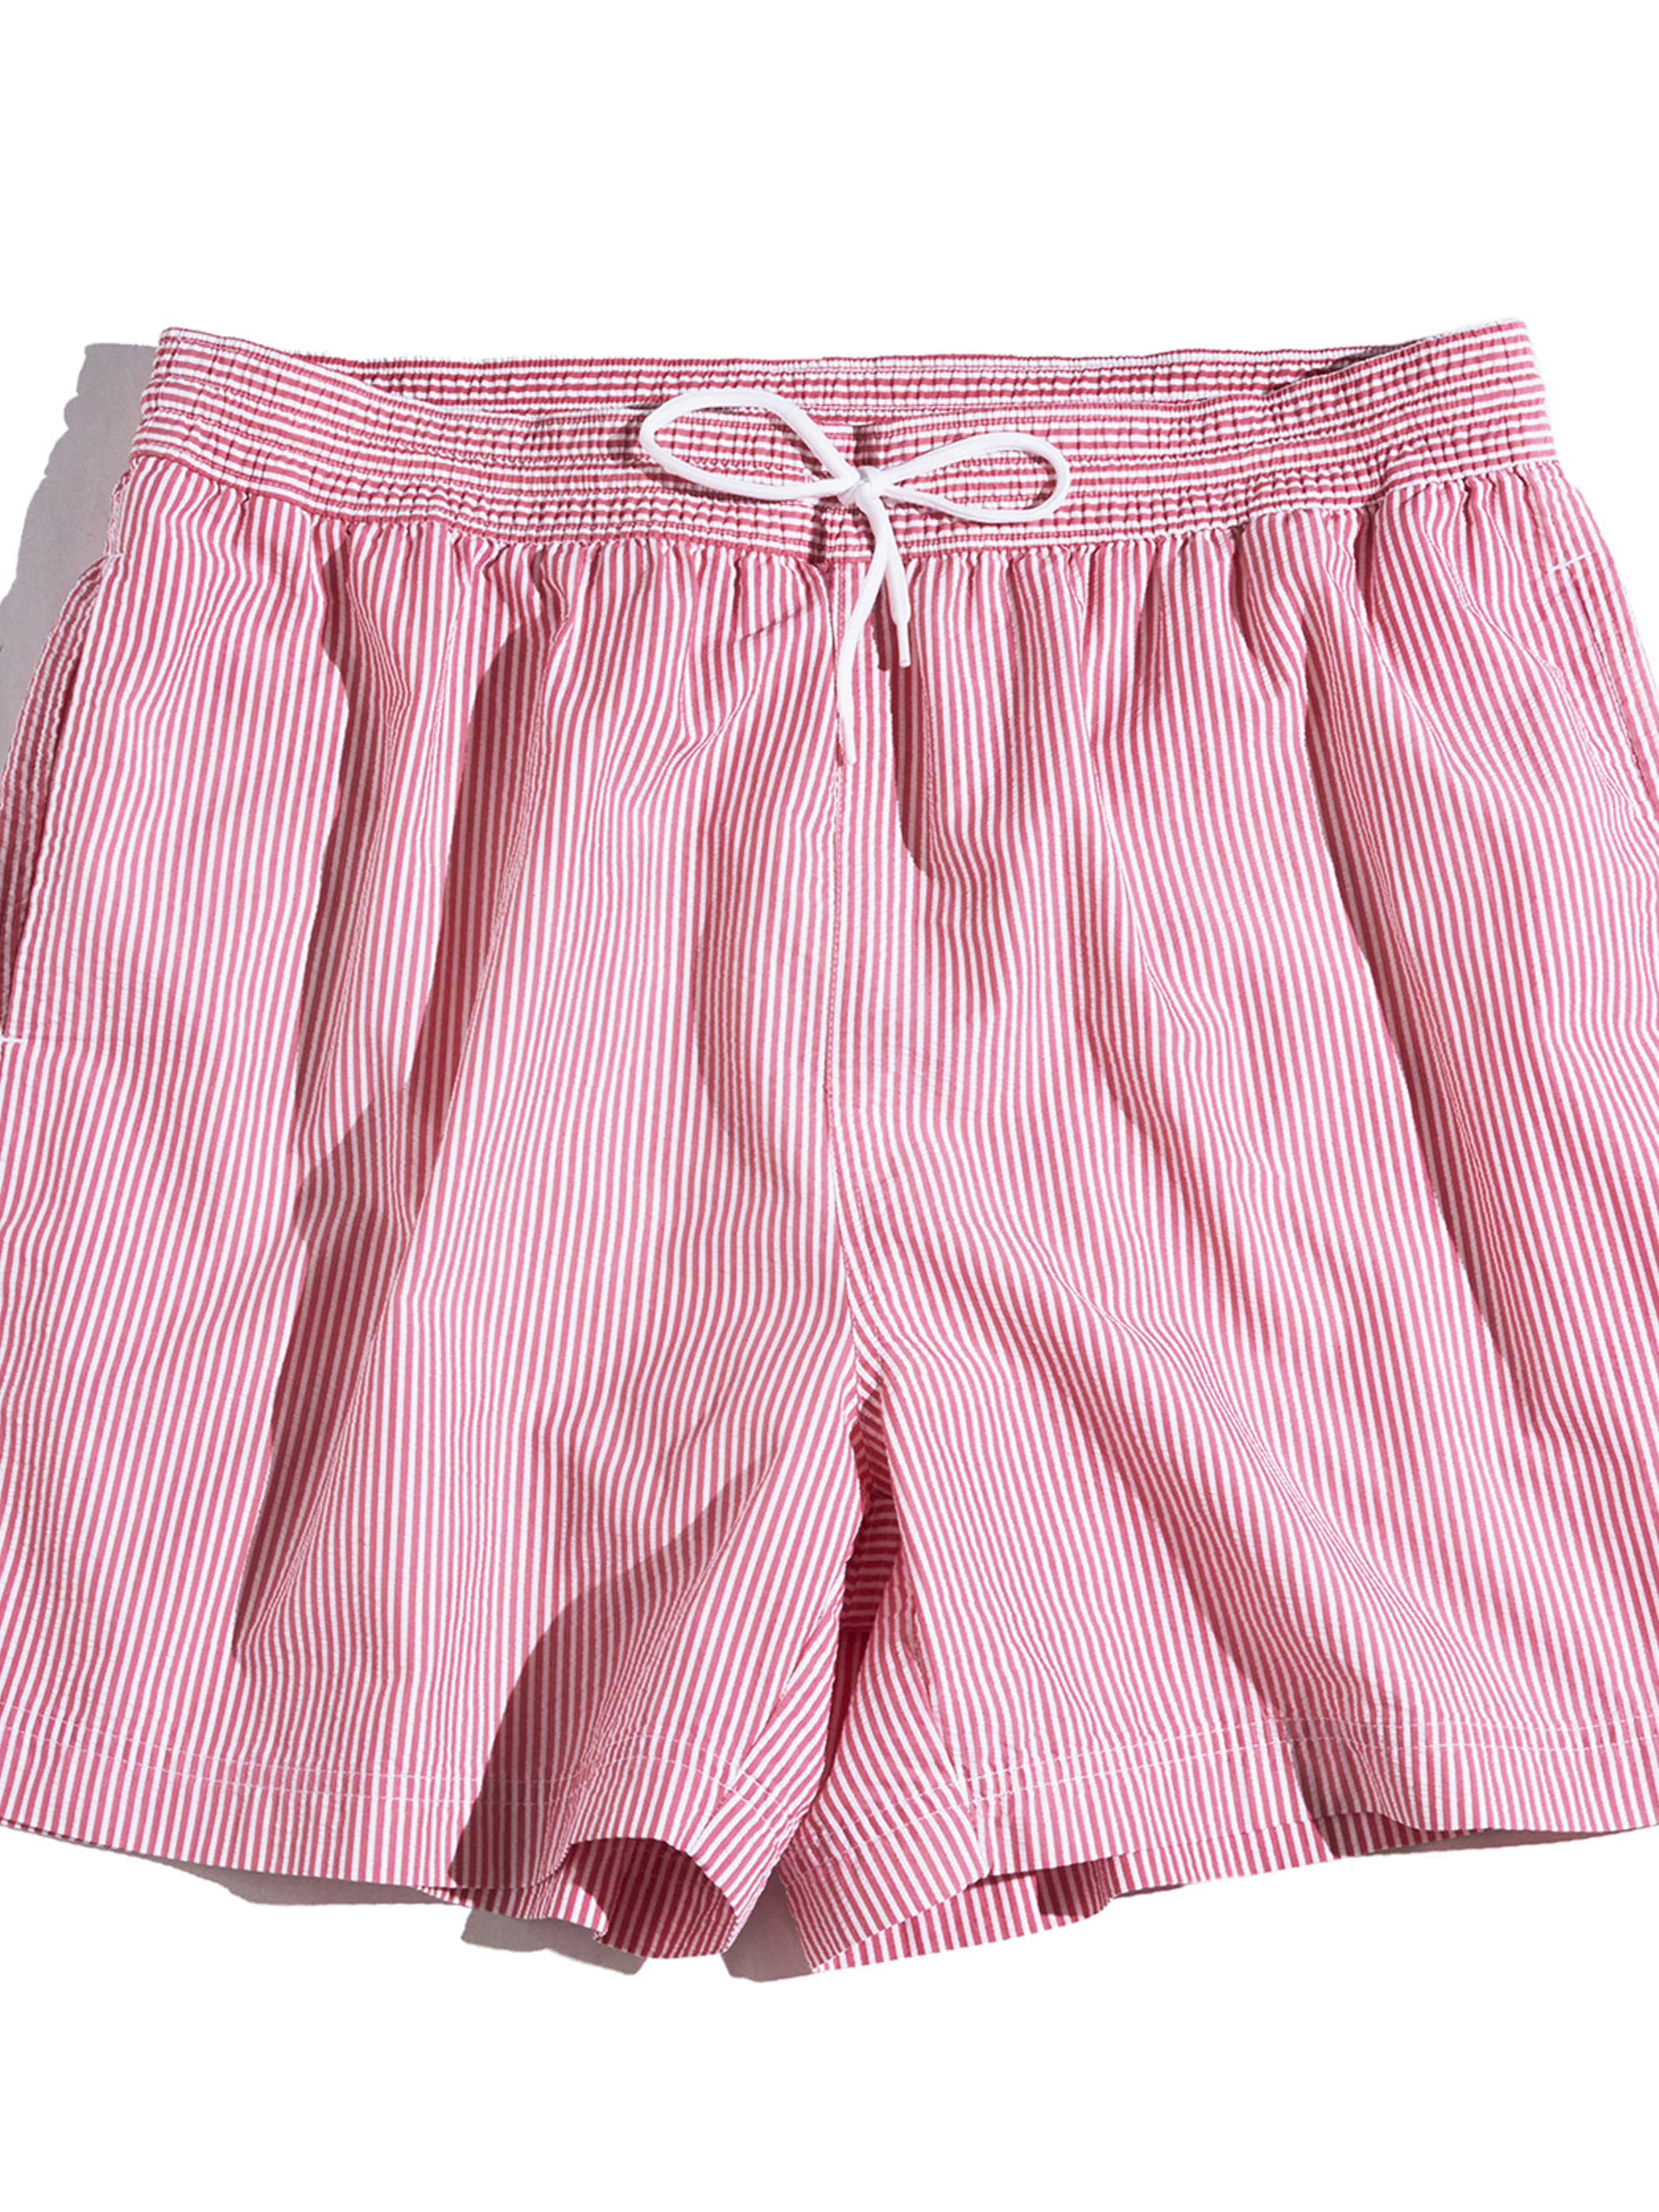 "1990s ""POLO by Ralph Lauren"" seersucker stripe shorts -PINK-"